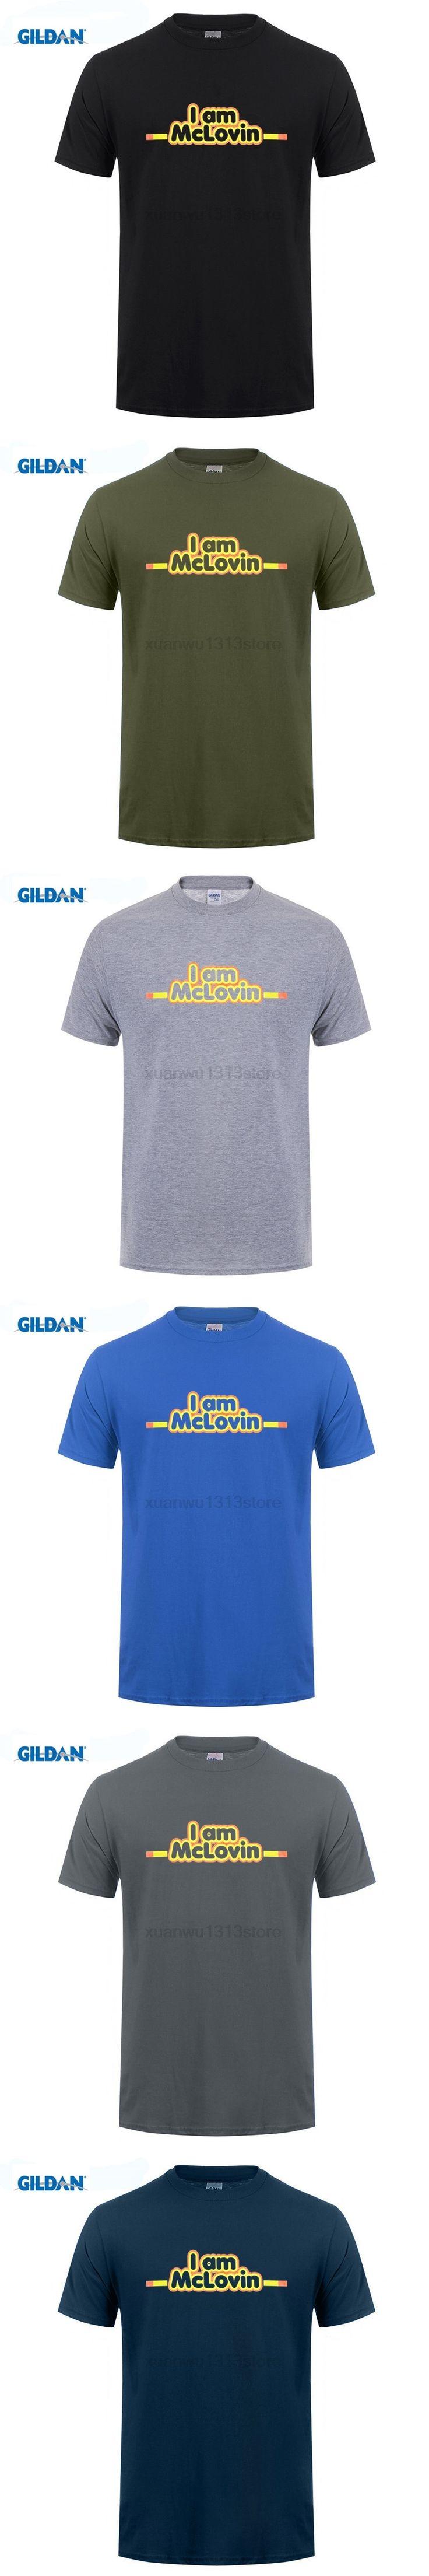 GILDAN I AM MCLOVIN HUMOR NEW T-SHIRT S M L XL 2XL SUPERBAD FOGELL JONAH HILL KICK-ASS Design Style  Short Sleeve T Shirt